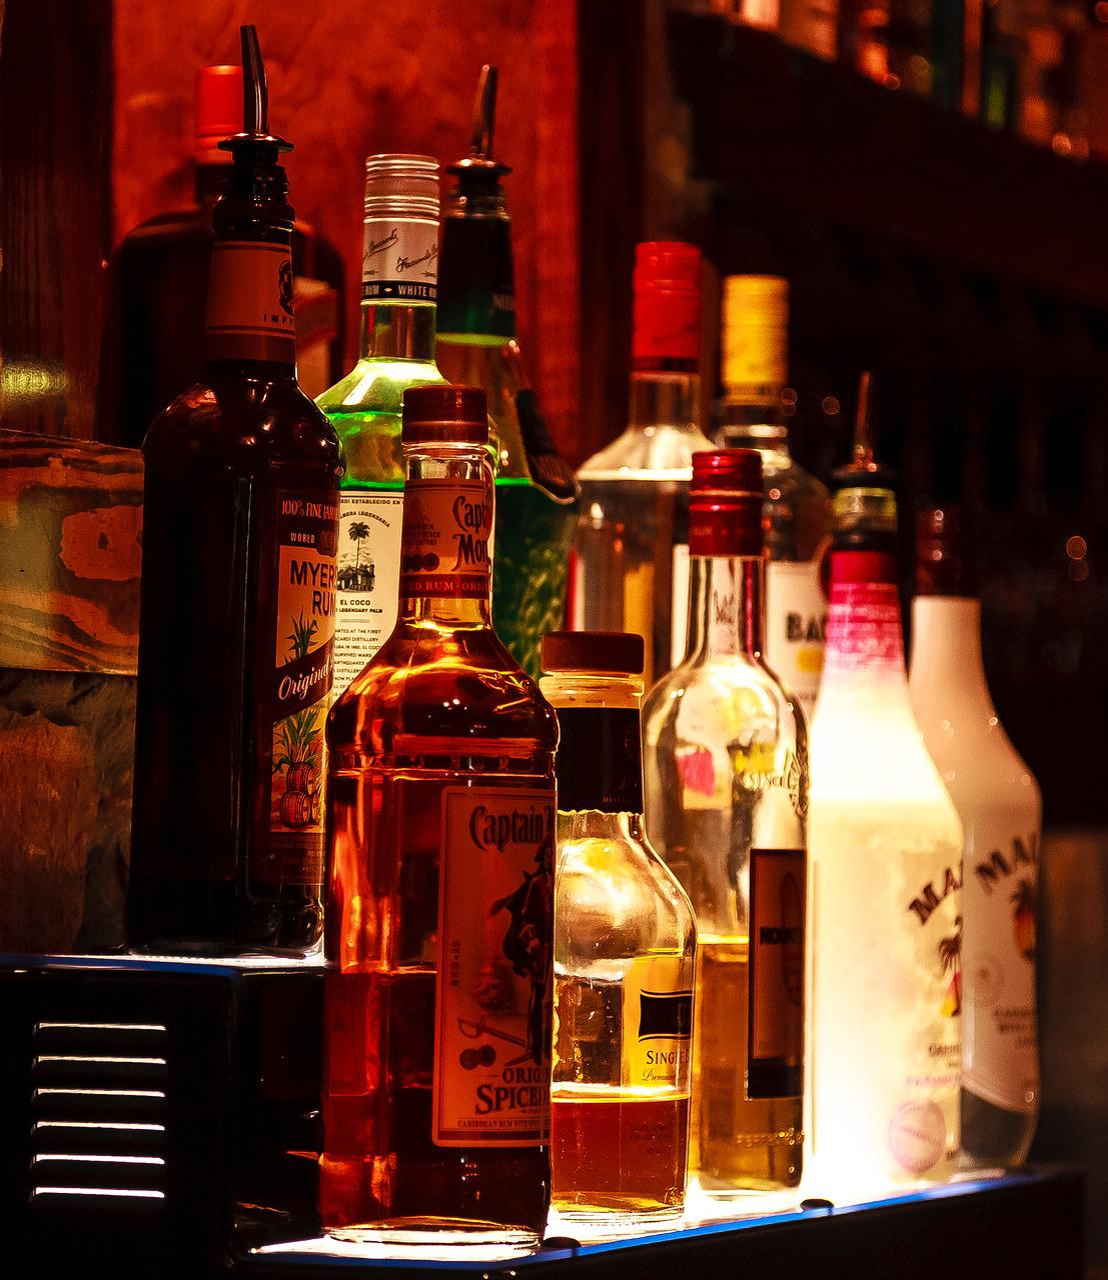 Картинки со спиртными напитками